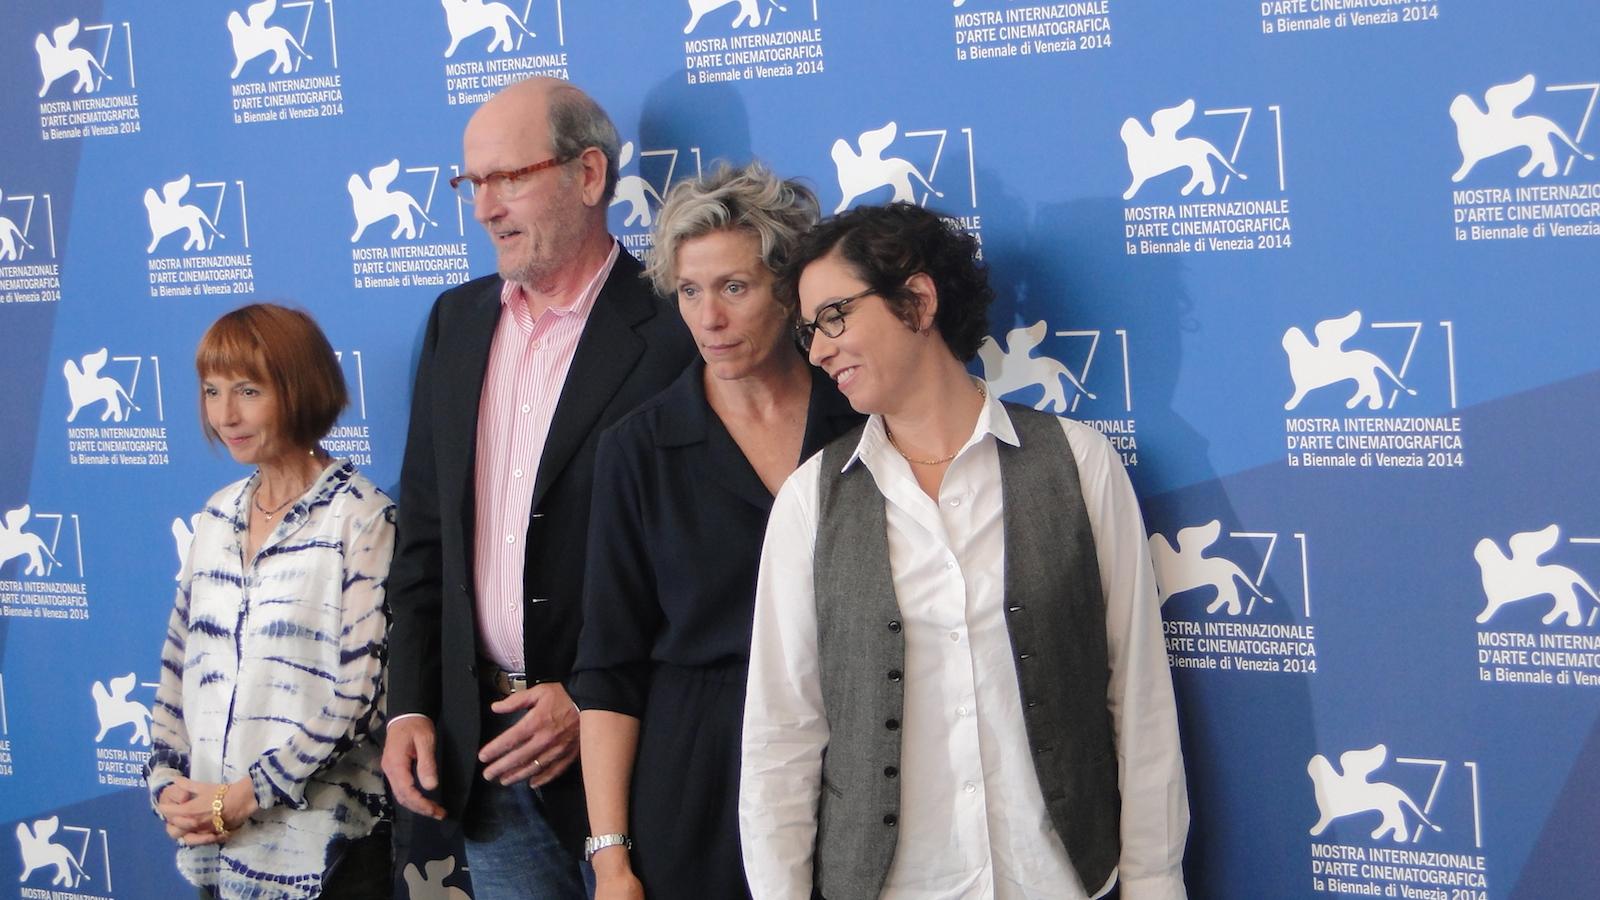 Olive Kitteridge: Frances McDormand con la regista Lisa Cholodenko, Jane Anderson e Richard Jenkins al photocall di Venezia 2014